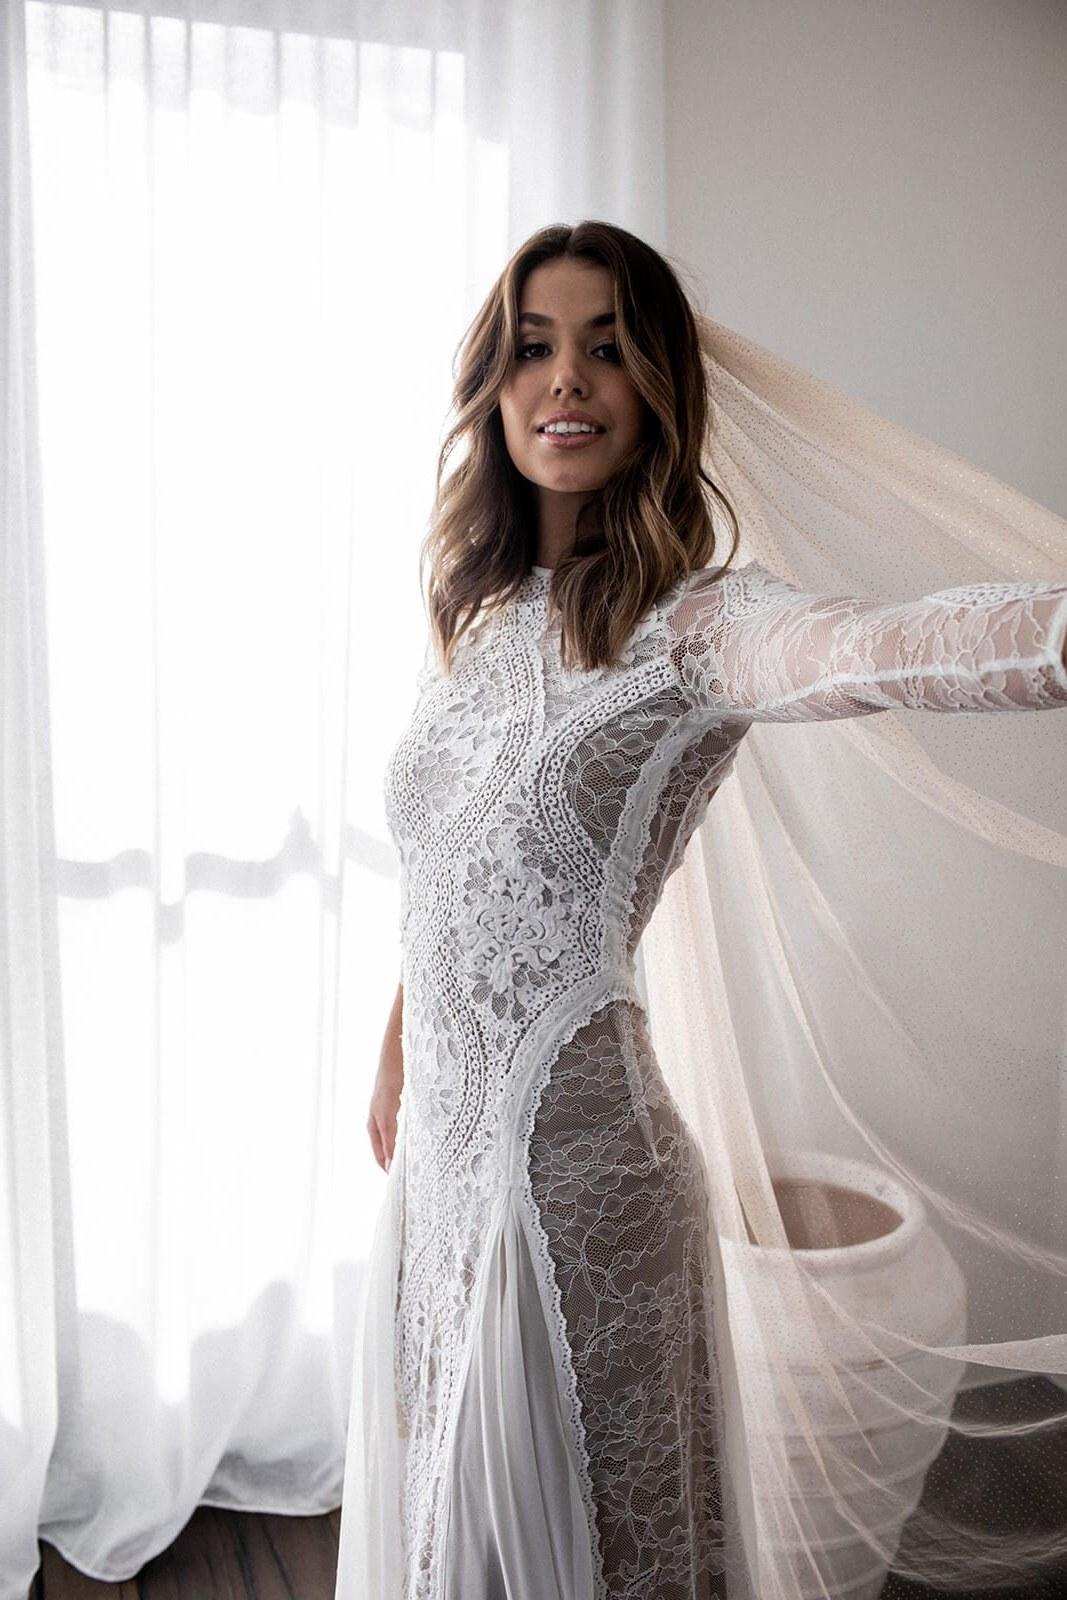 Ide Long Dress Bridesmaid Hijab Budm Inca